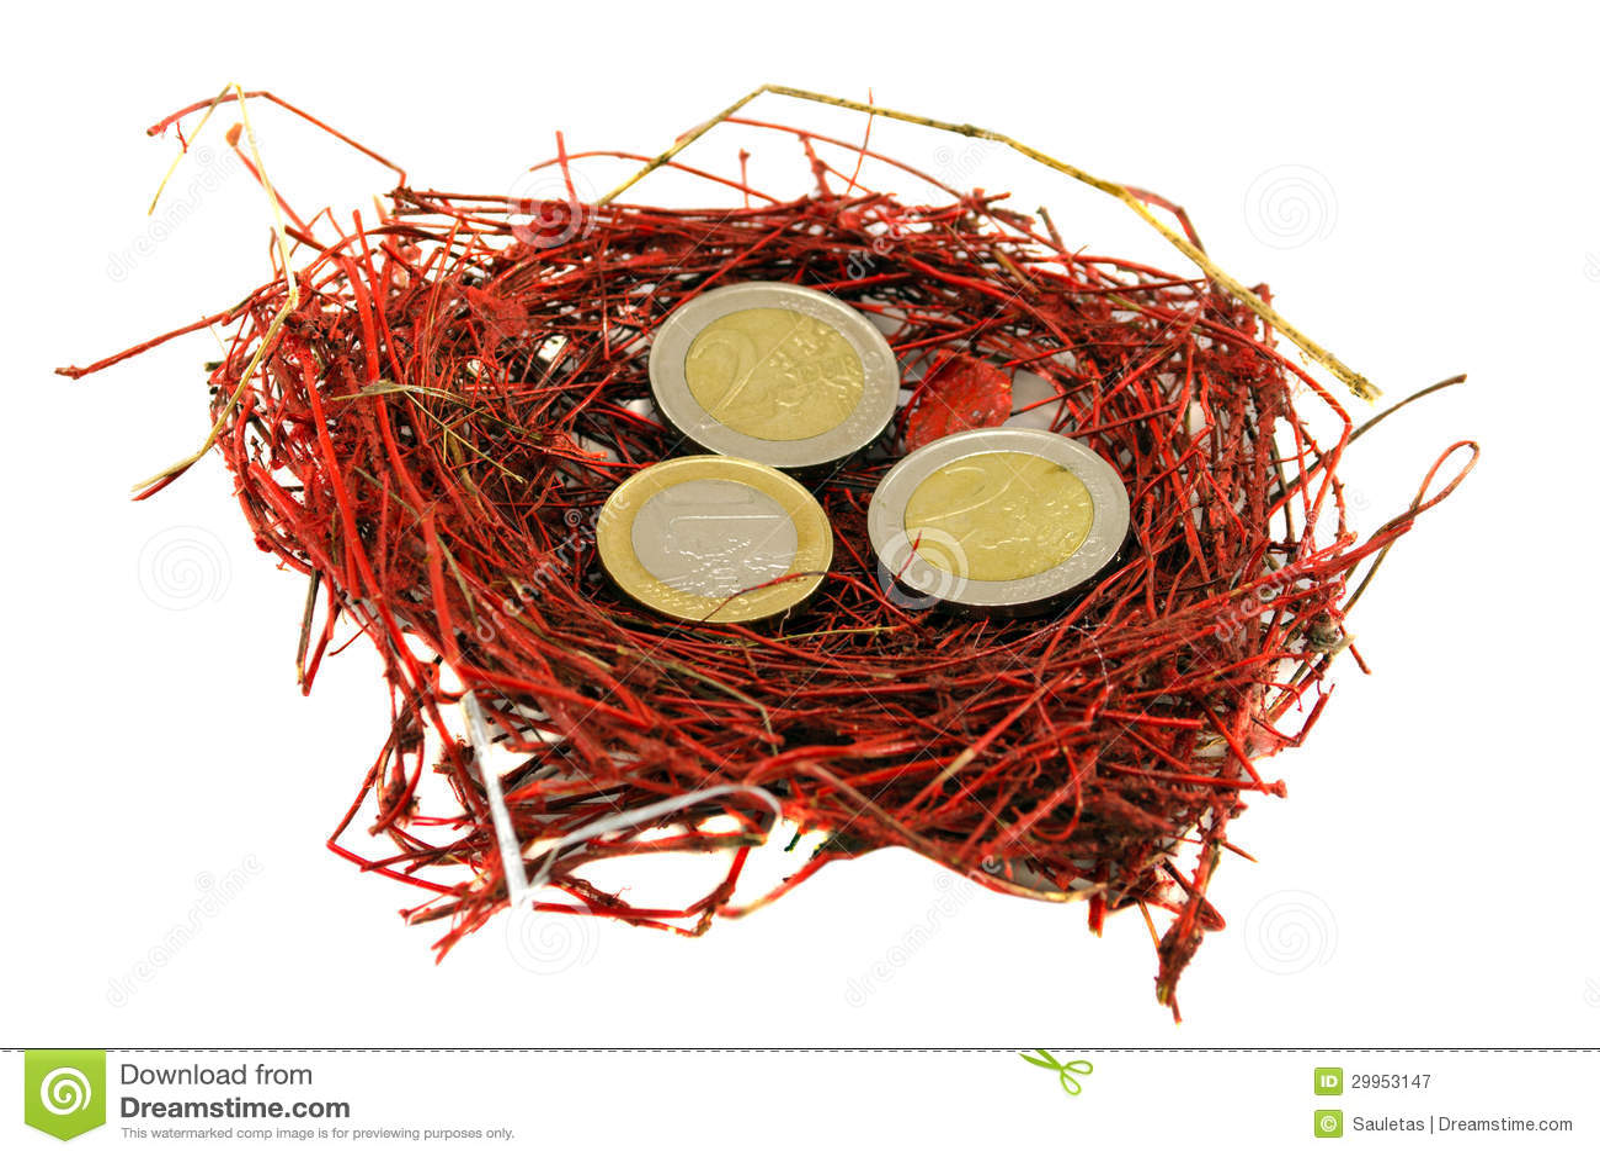 red bird nest and - photo #9